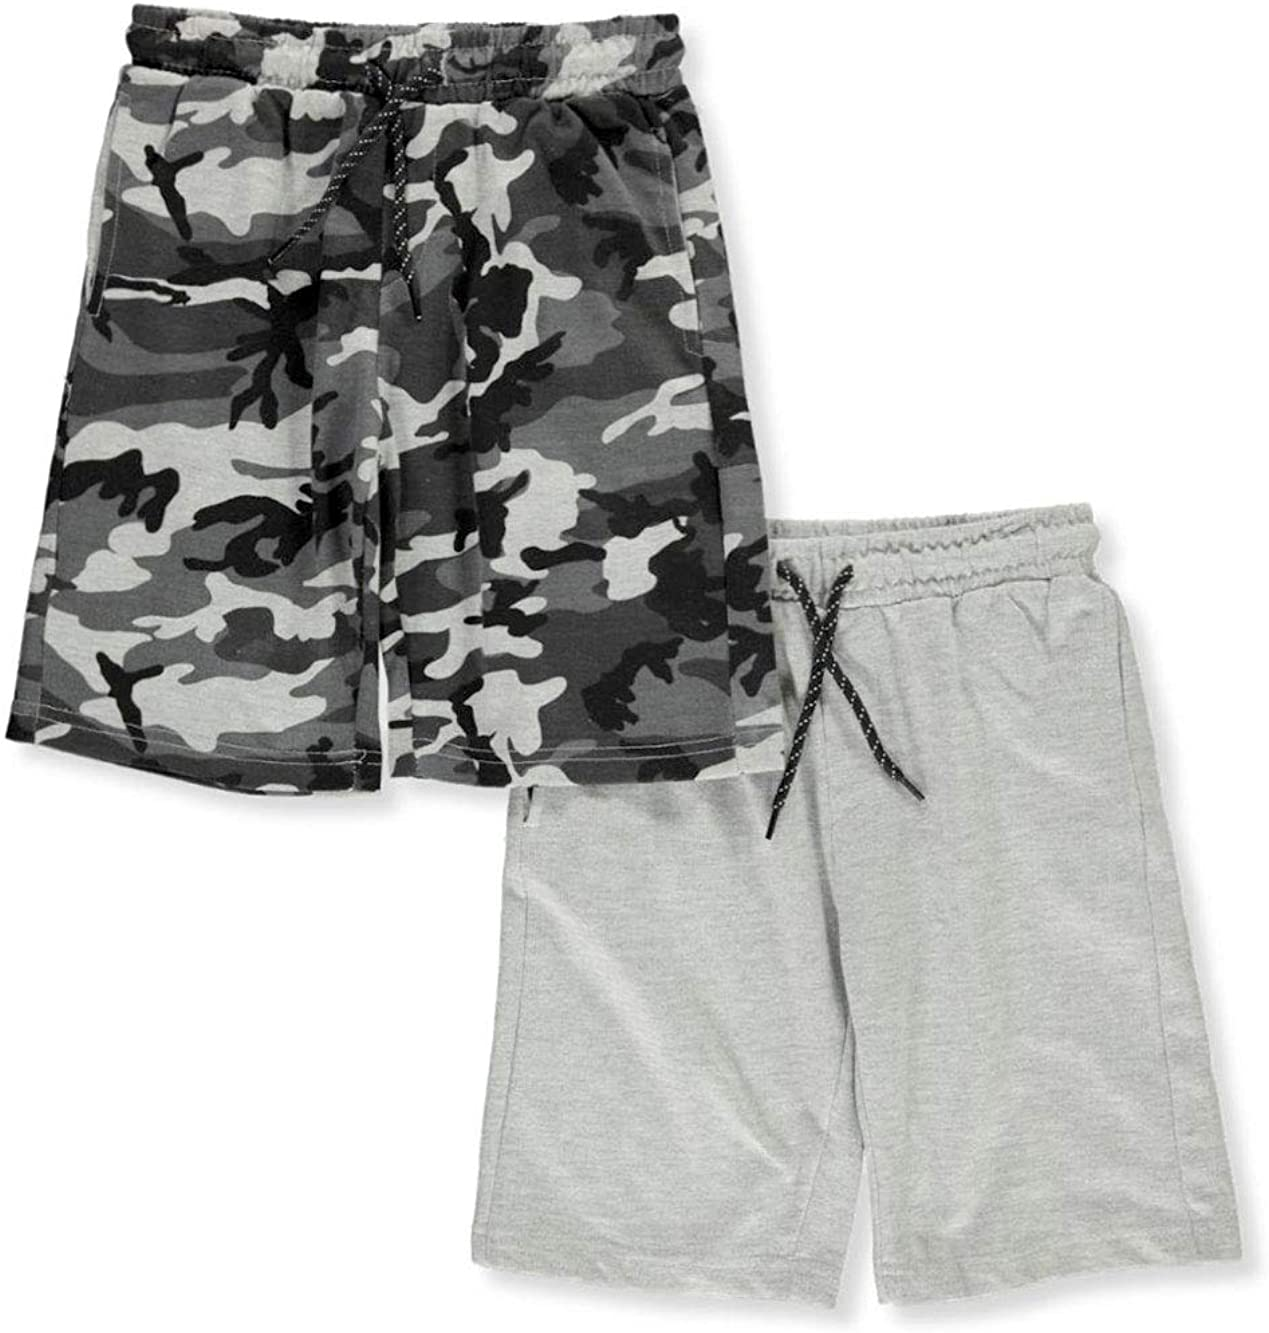 Hawk Boys' 2-Pack Terry Shorts